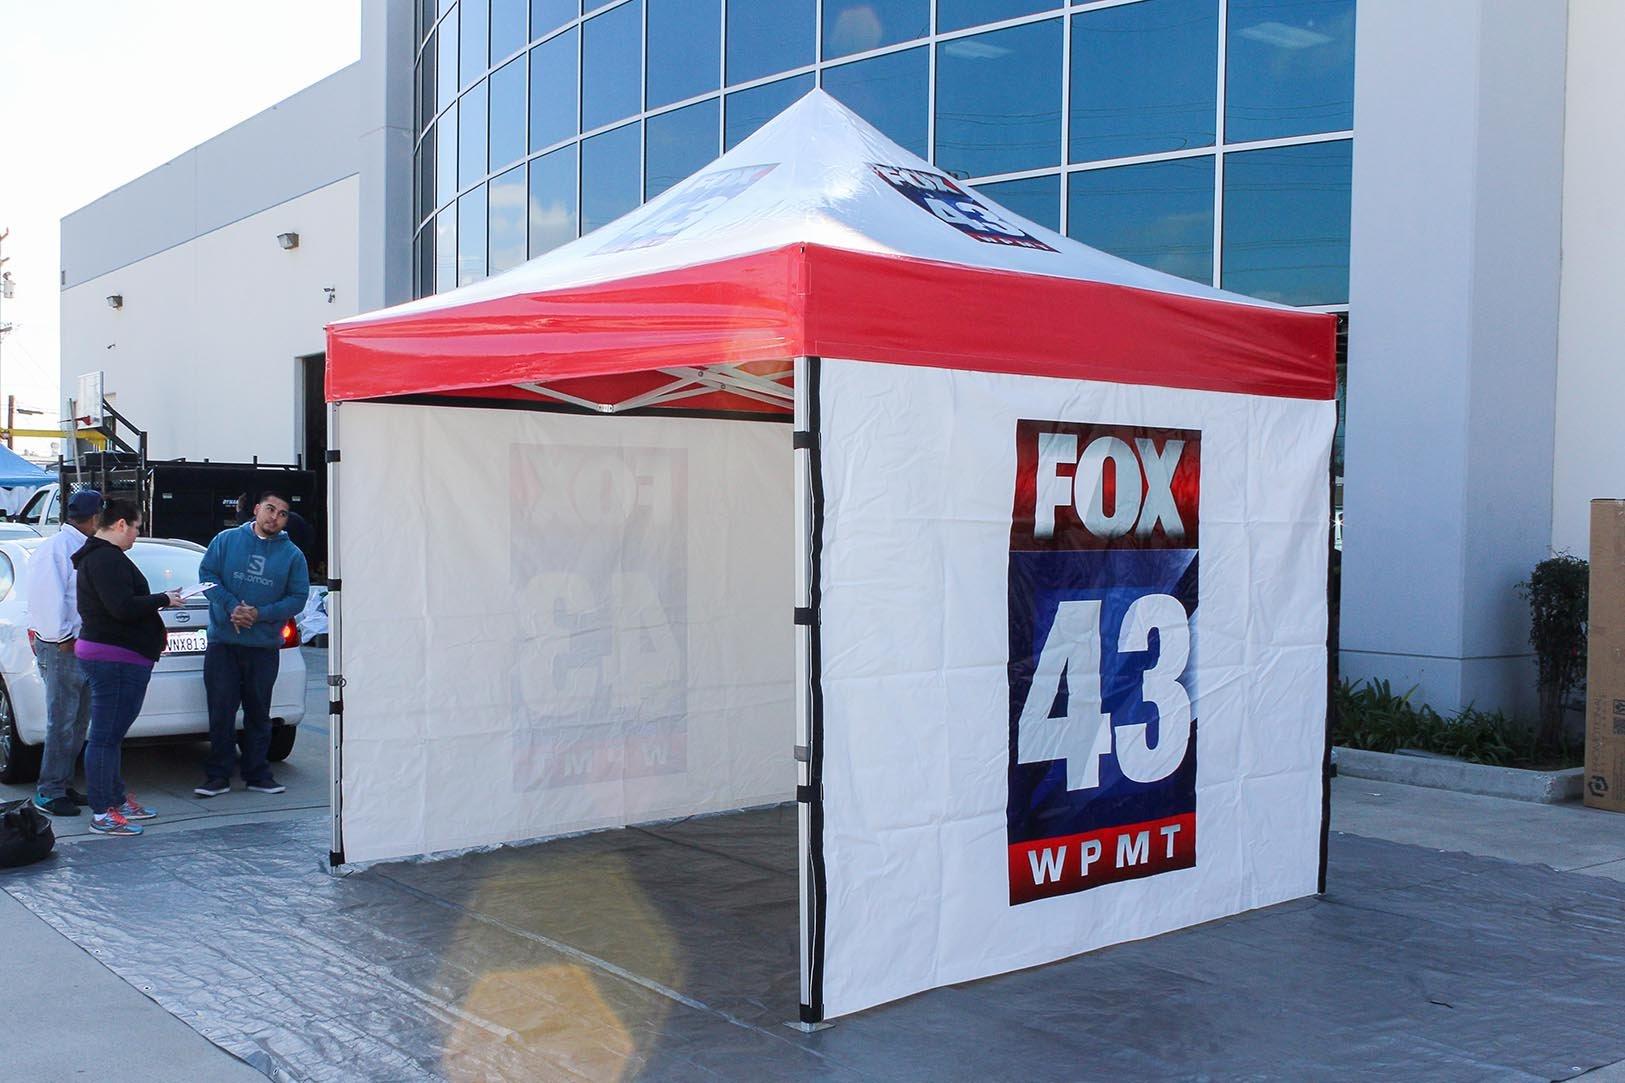 fox-43-printed-canopy